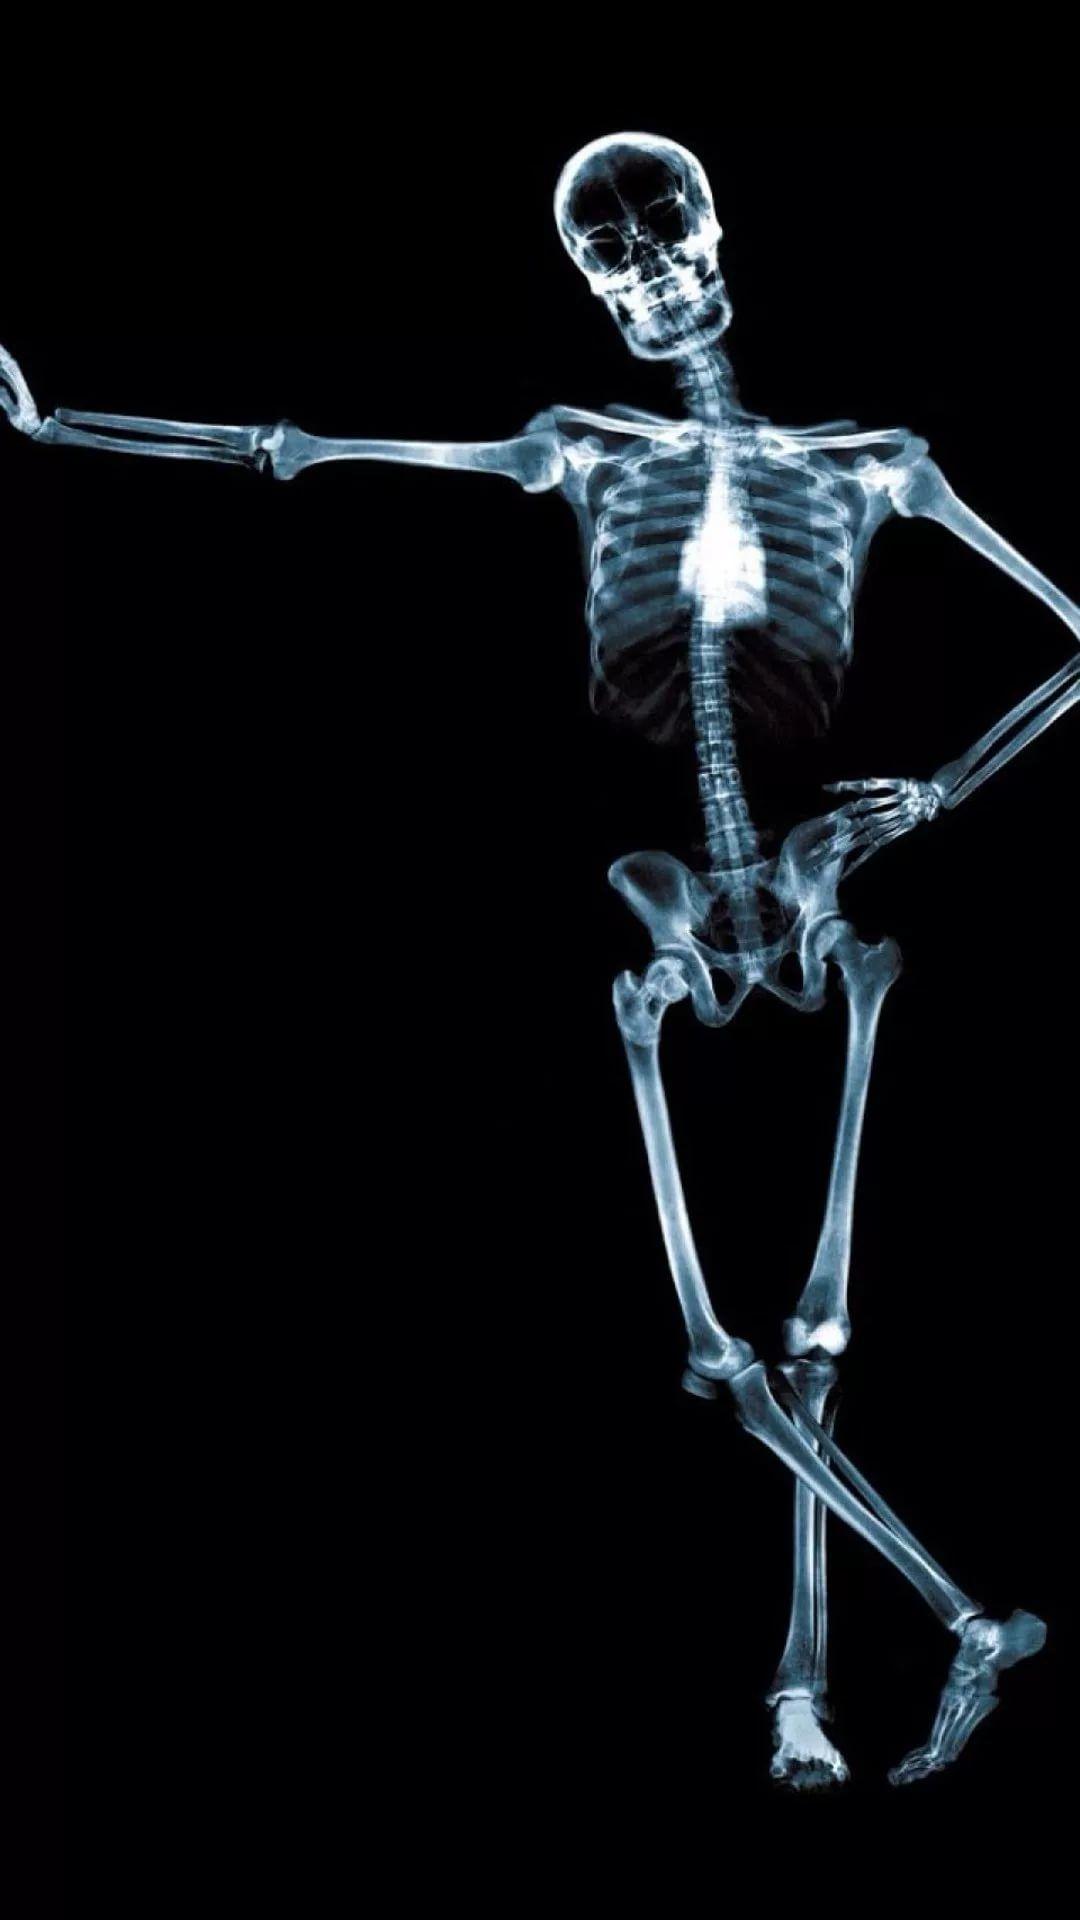 Старых открыток, прикольные картинки скелета человека